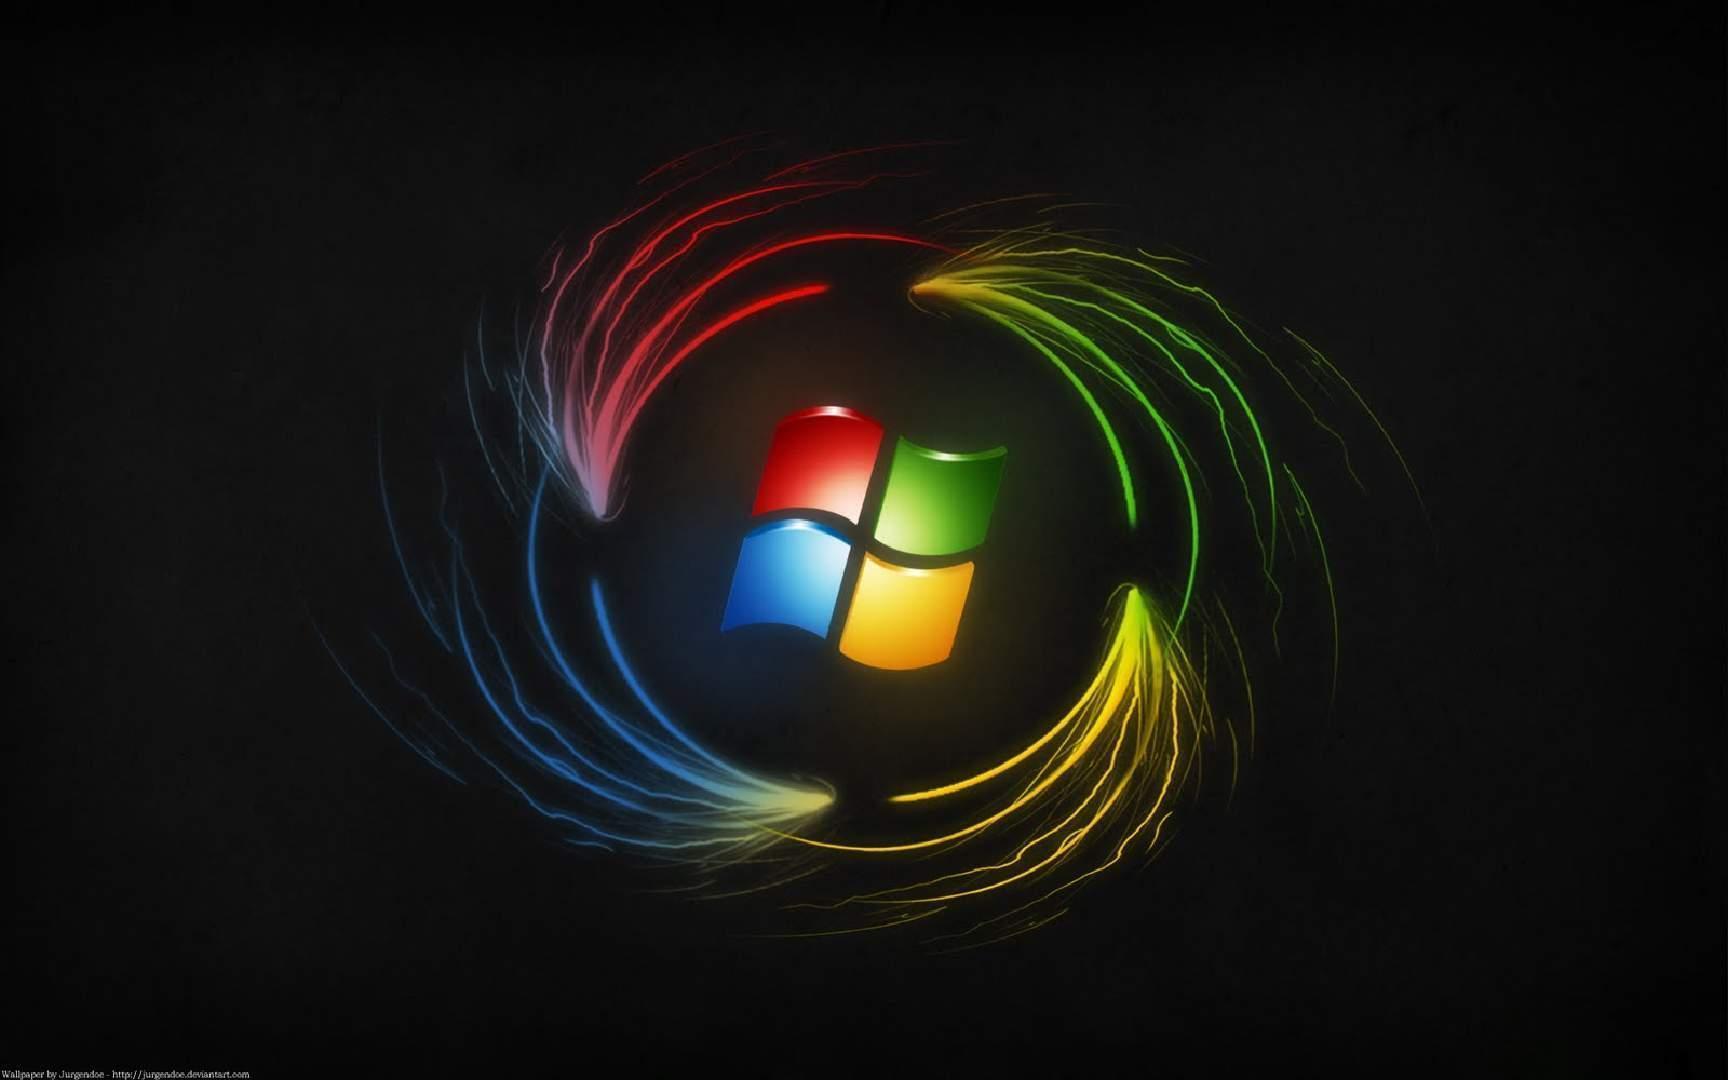 Desktop Backgrounds Microsoft - Wallpaper Cave